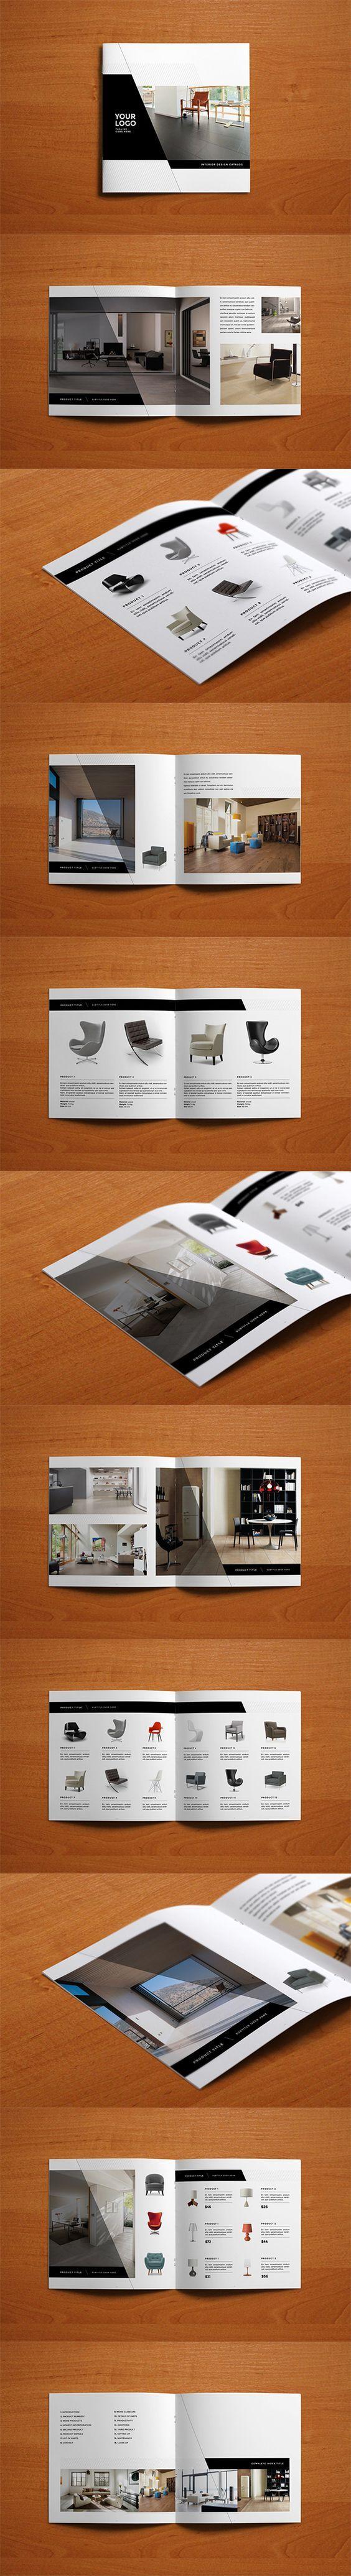 Minimal Interior Design Catalog. Download here: http://graphicriver.net/item/minimal-interior-design-catalog/9849569?ref=abradesign #design #brochure #catalog: